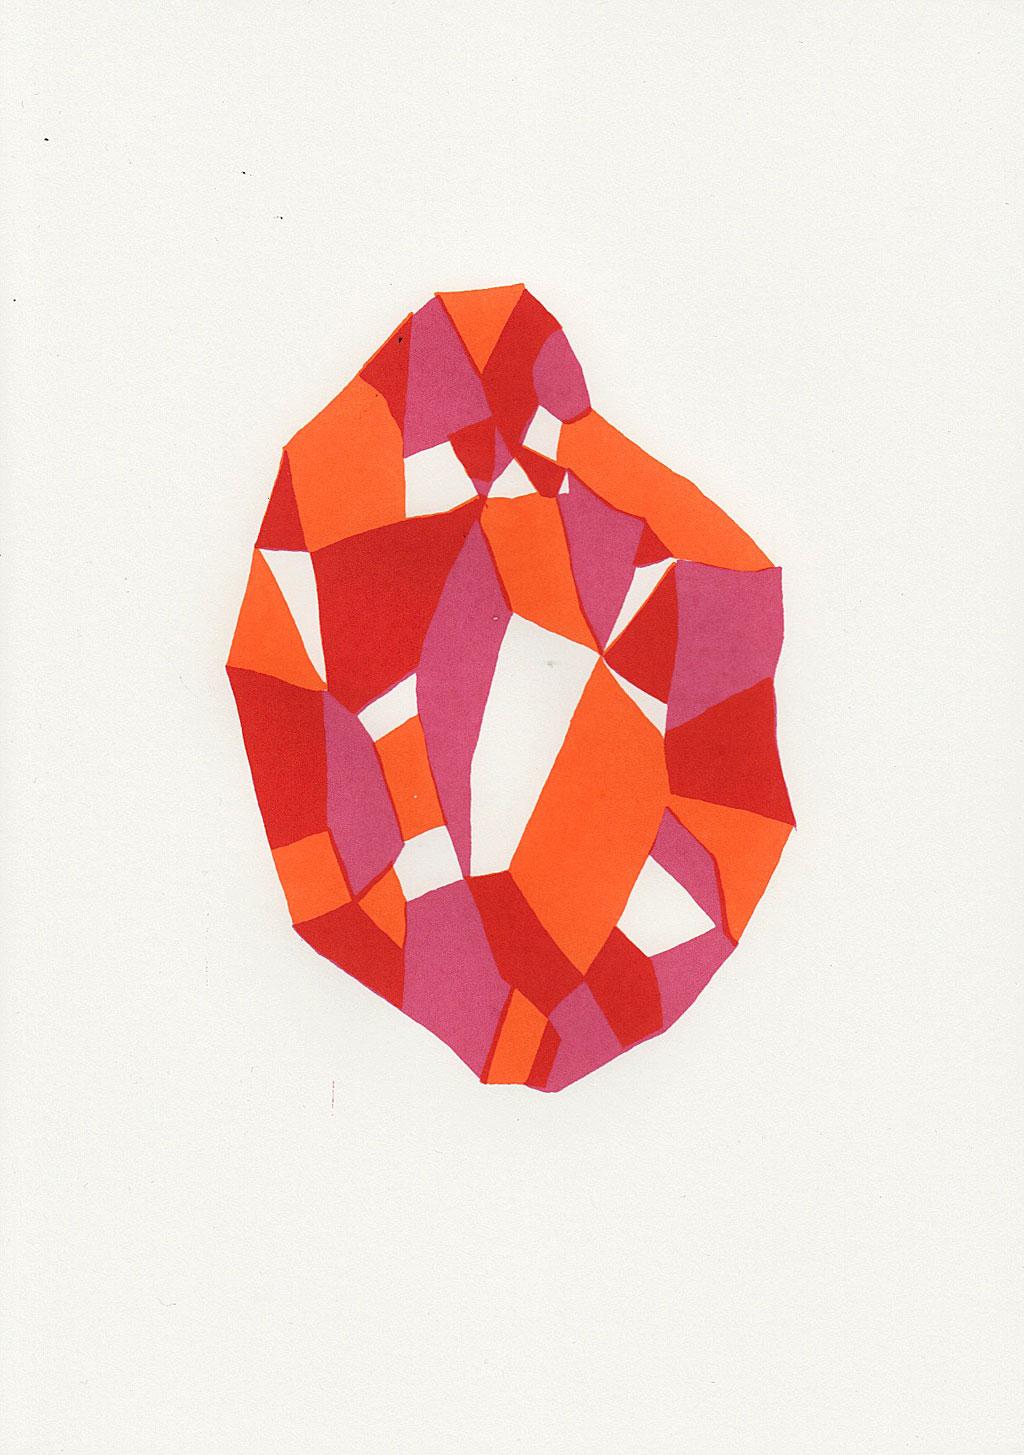 silkscreen print of a a raw diamond in red and orange